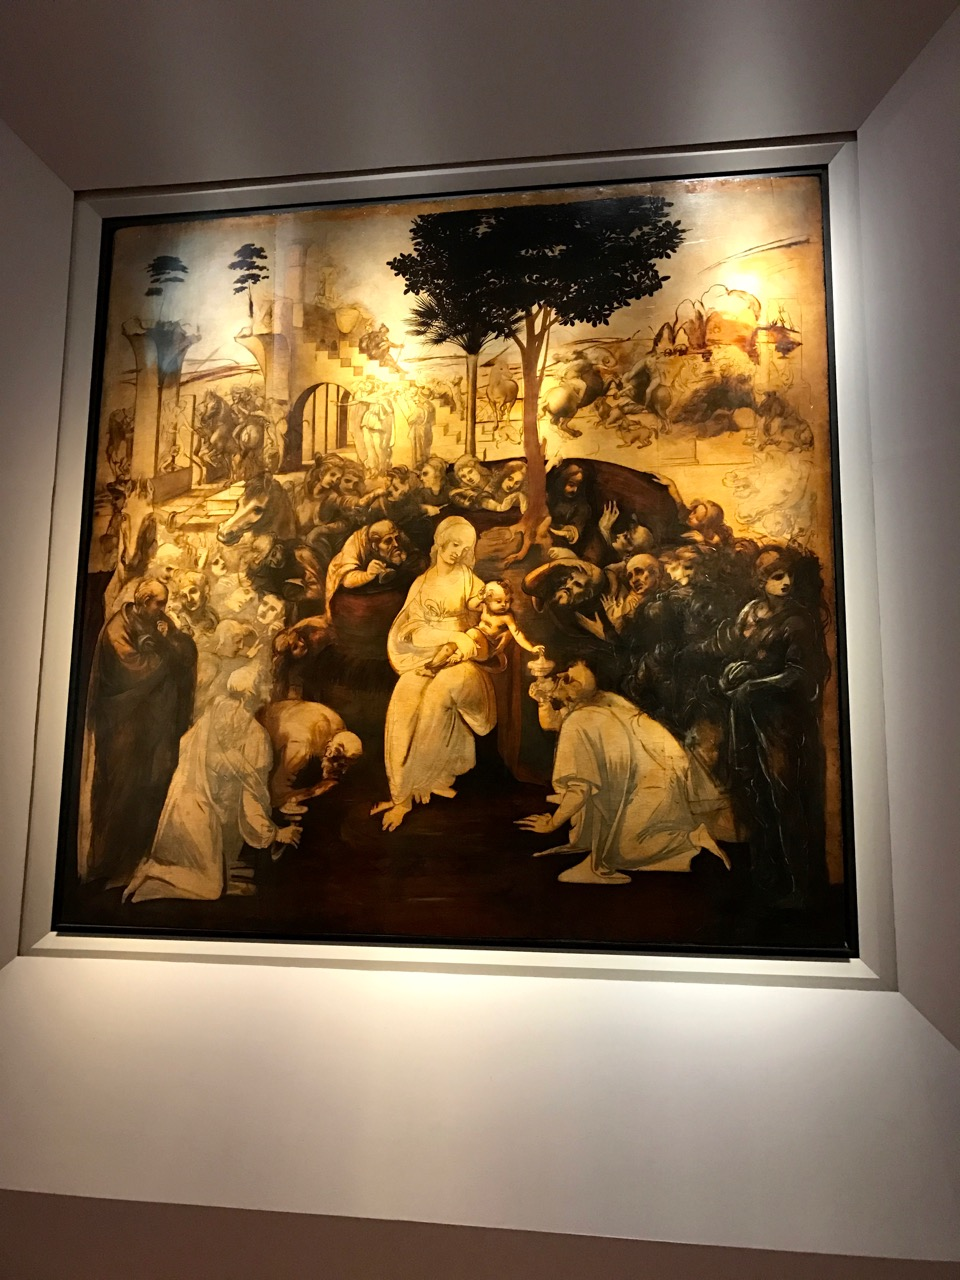 Unfinished work by da Vinci